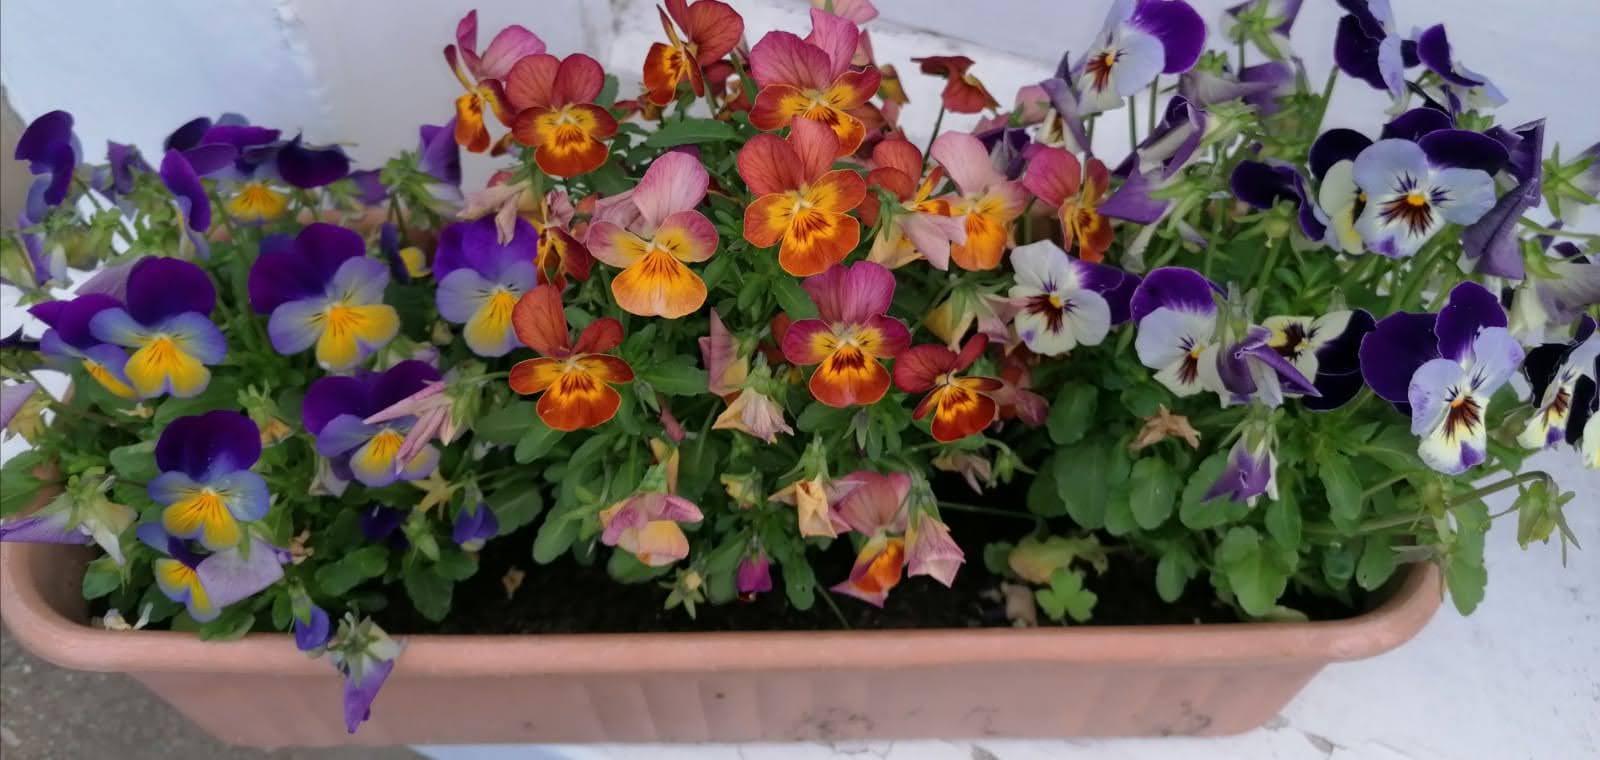 Best Pot Plant: Memory, Seeds Project